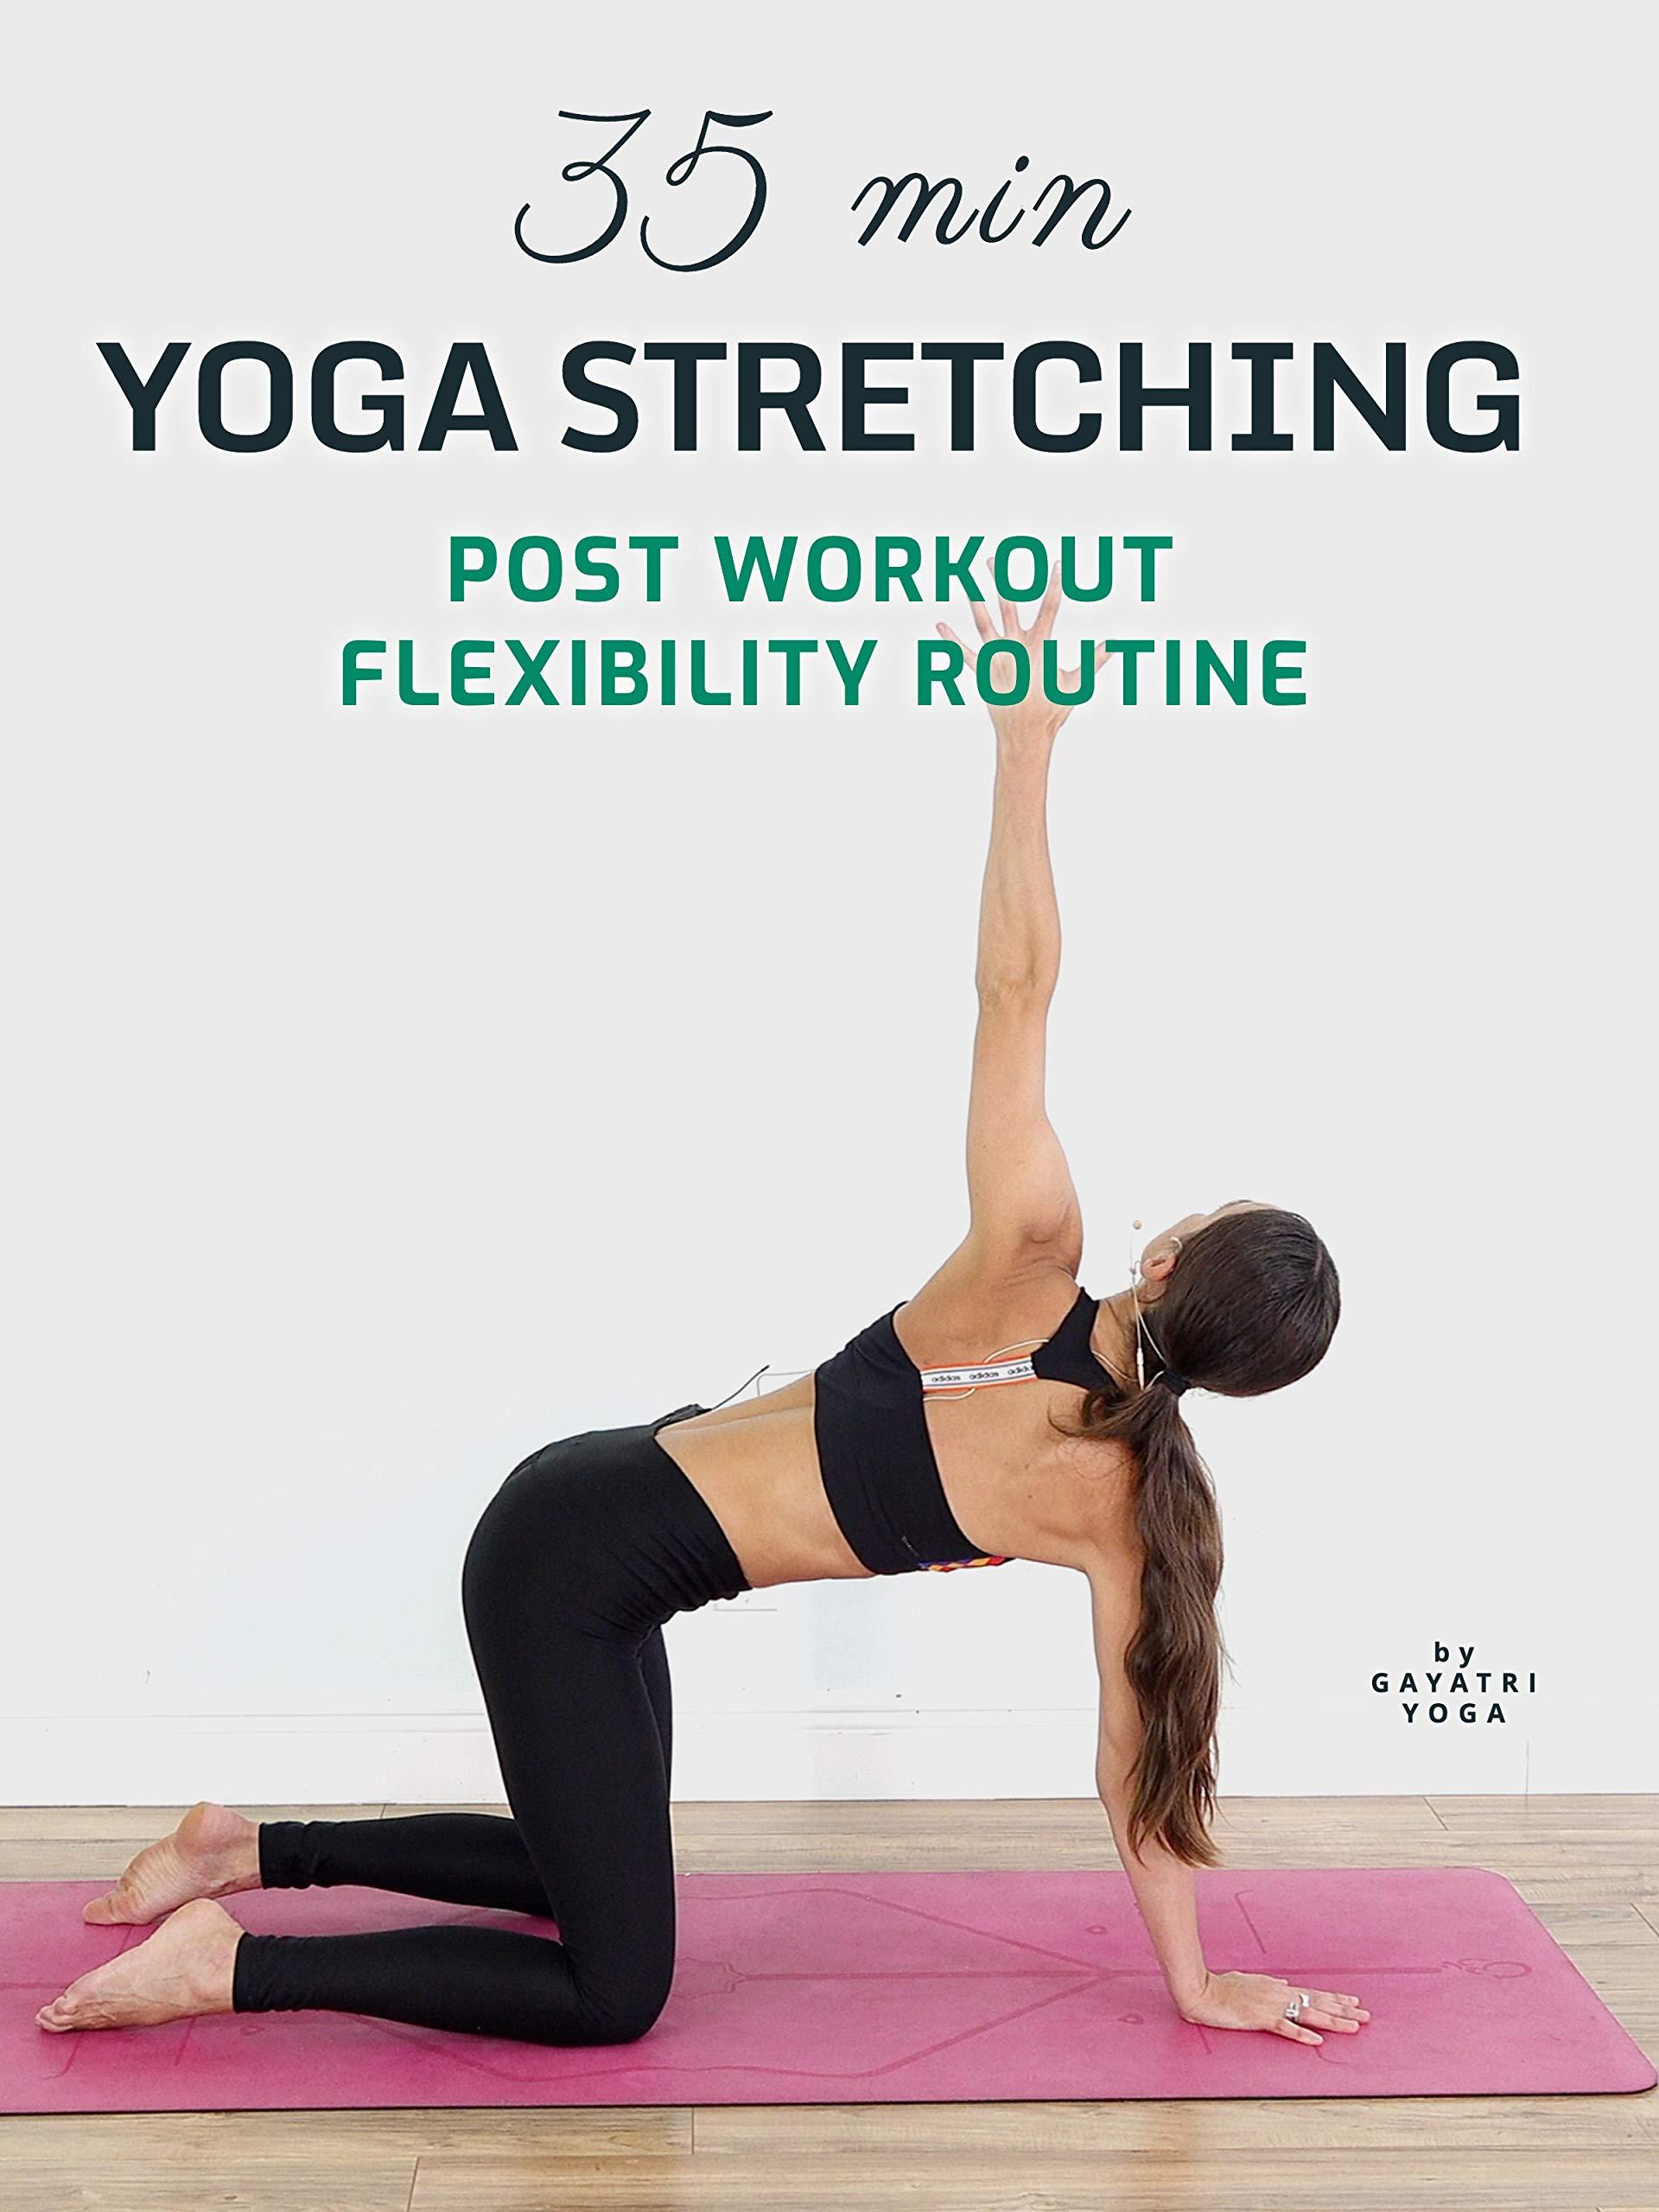 35 Min Yoga Stretching - Post Workout Flexibility Routine - Gayatri Yoga